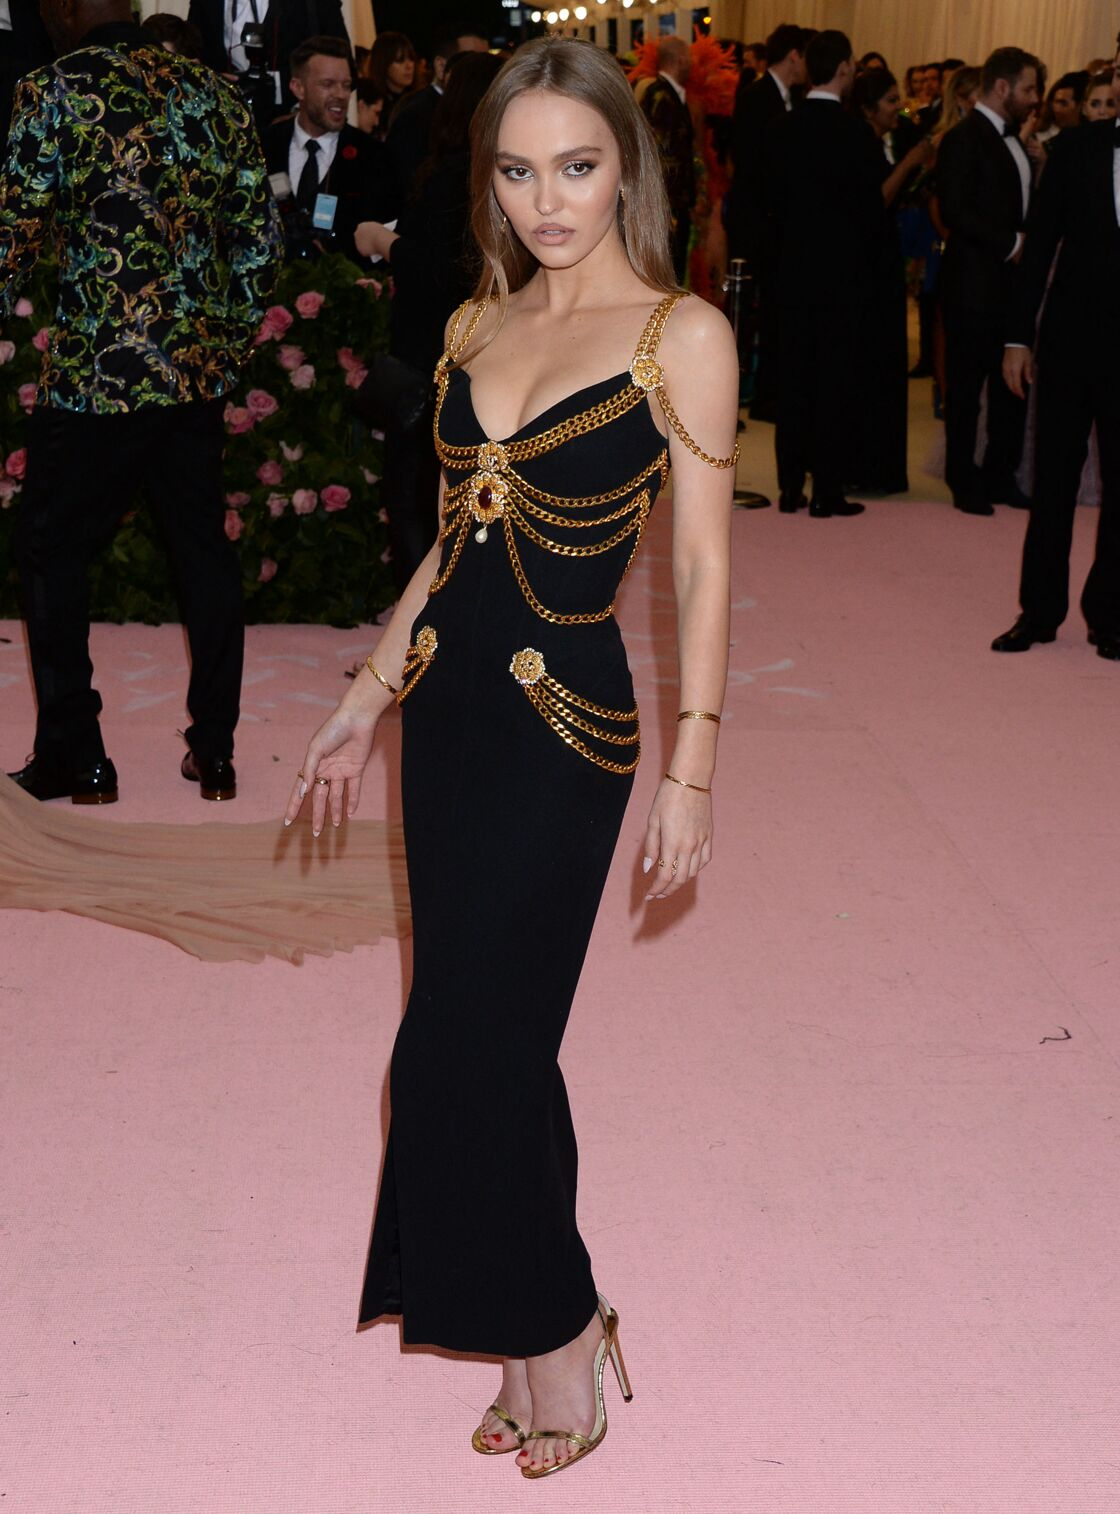 Sulfureuse, Lily Rose Depp fait sensation en robe Chanel au Met Gala, conçue par Karl Lagerfeld en 1992